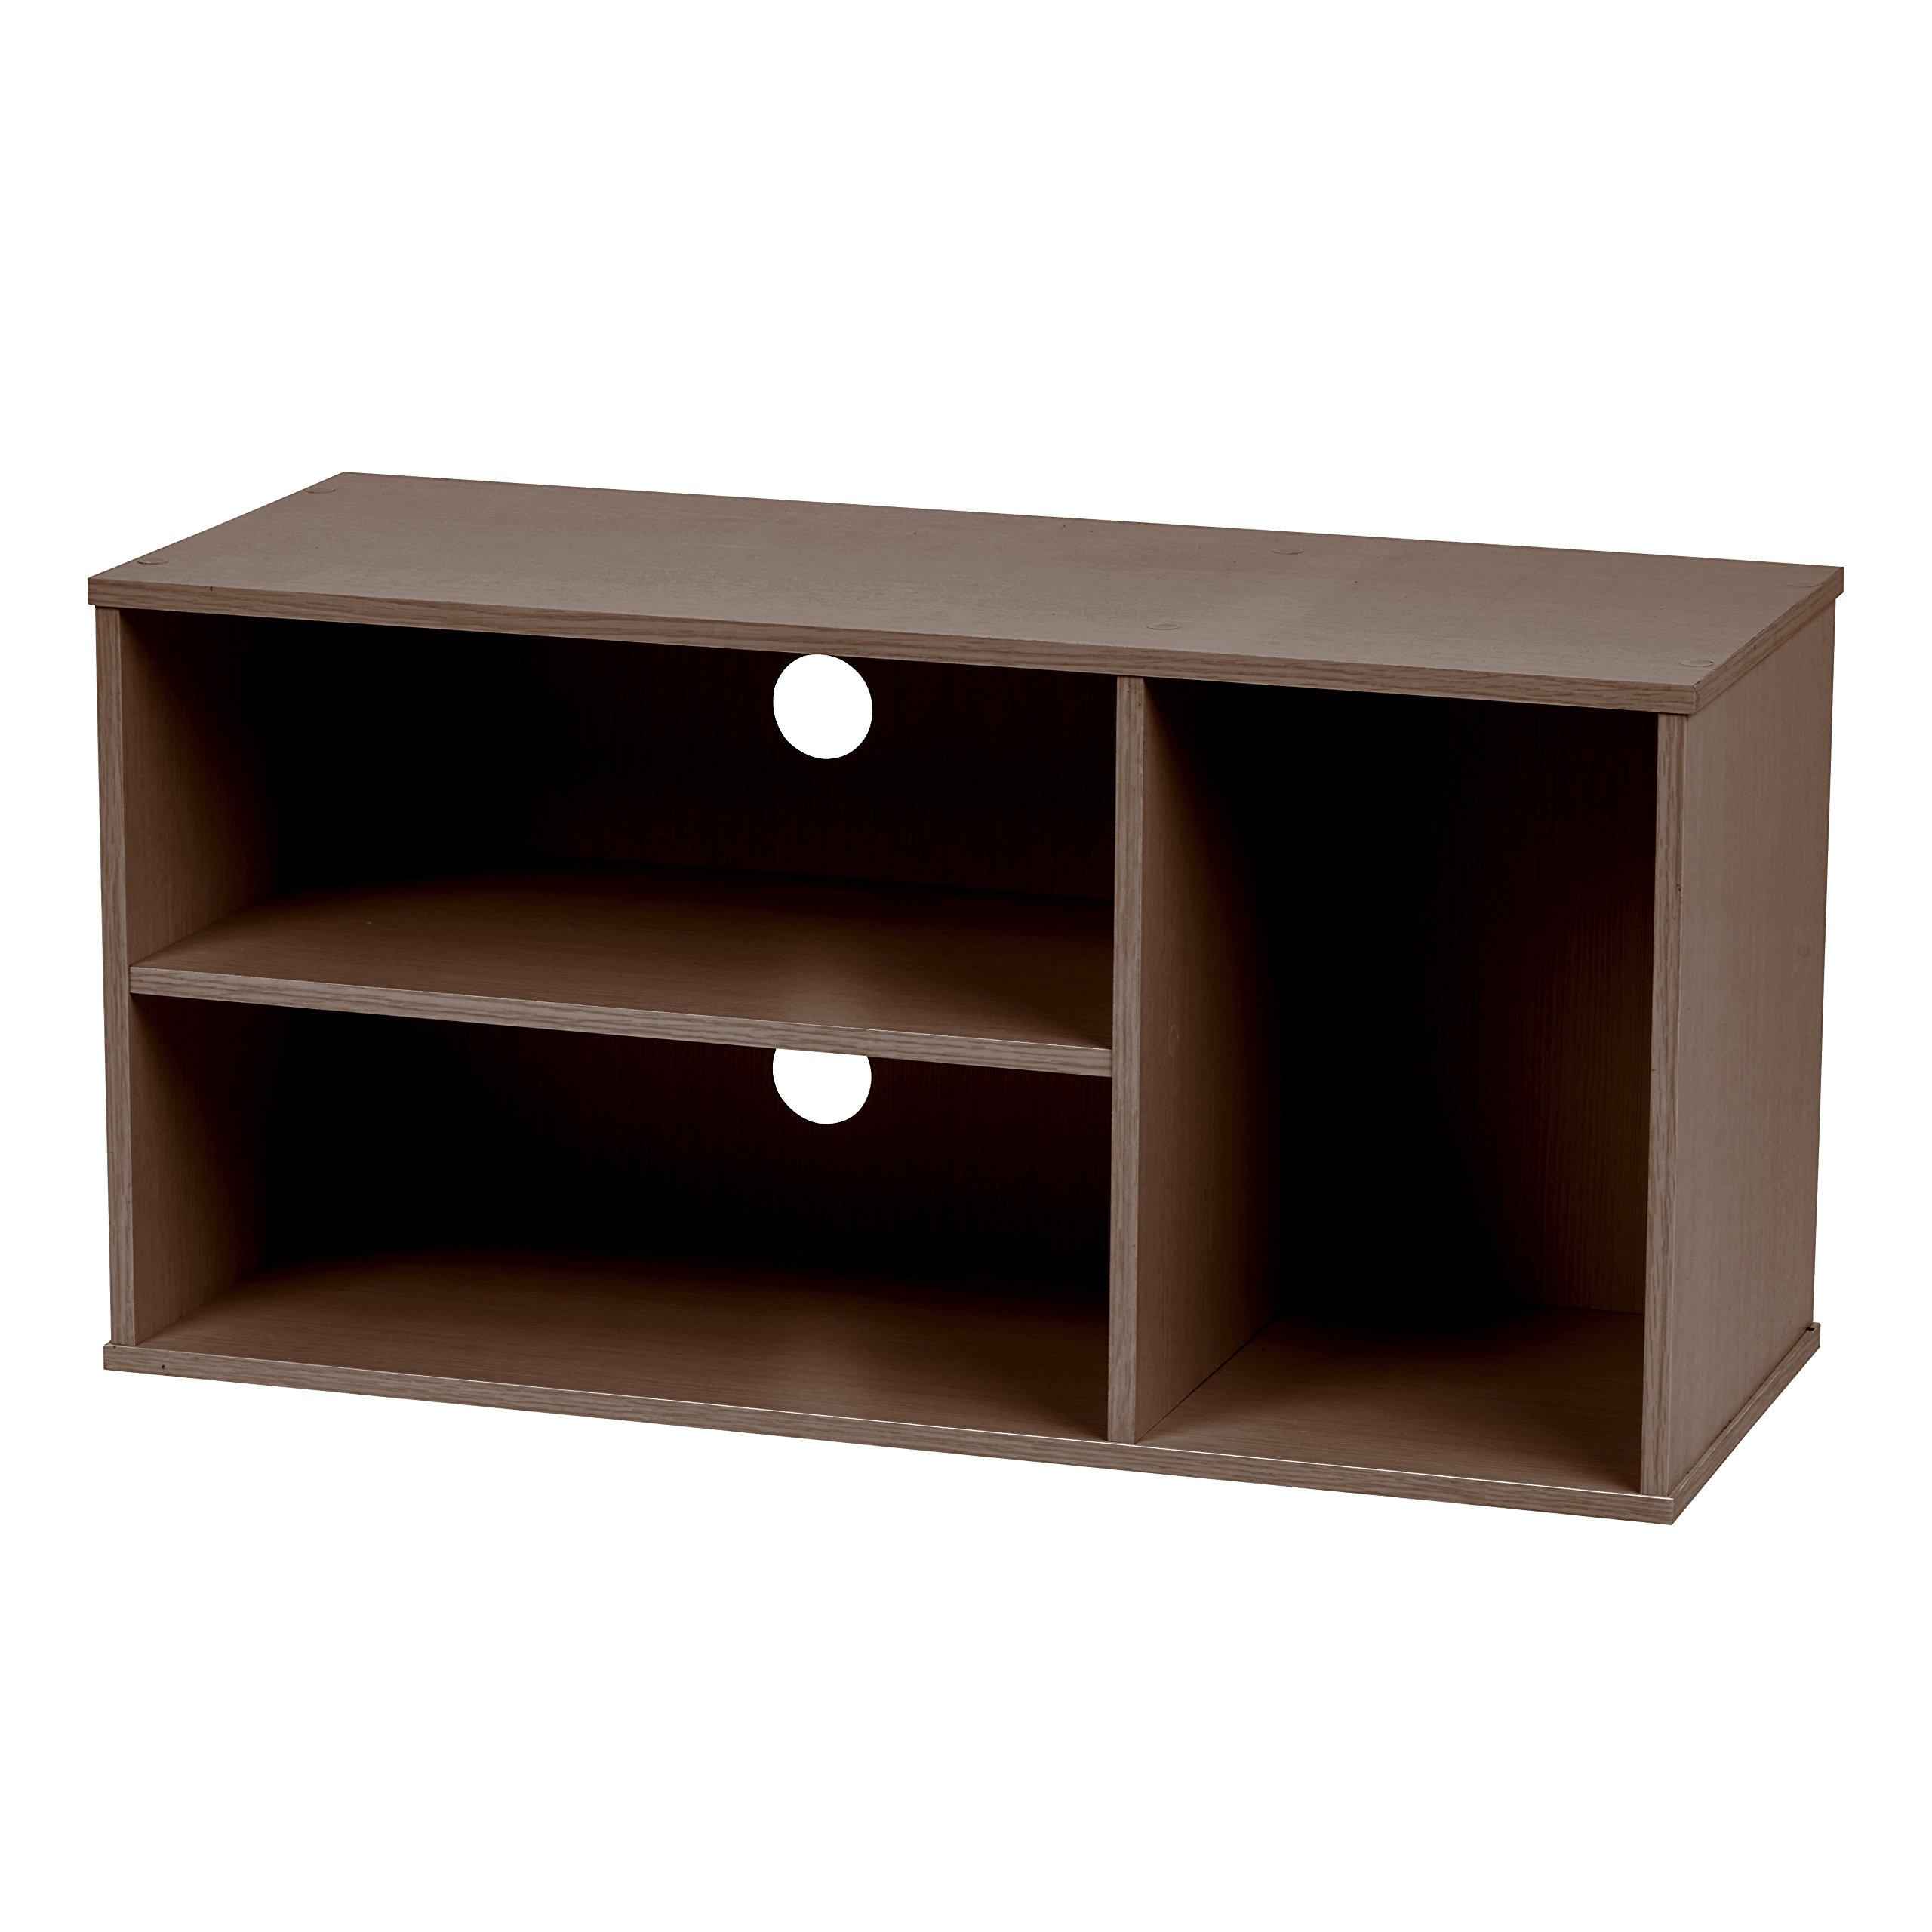 IRIS USA, MDB-3SBO, Modular TV Stand Box, Brown Oak, 1 Pack